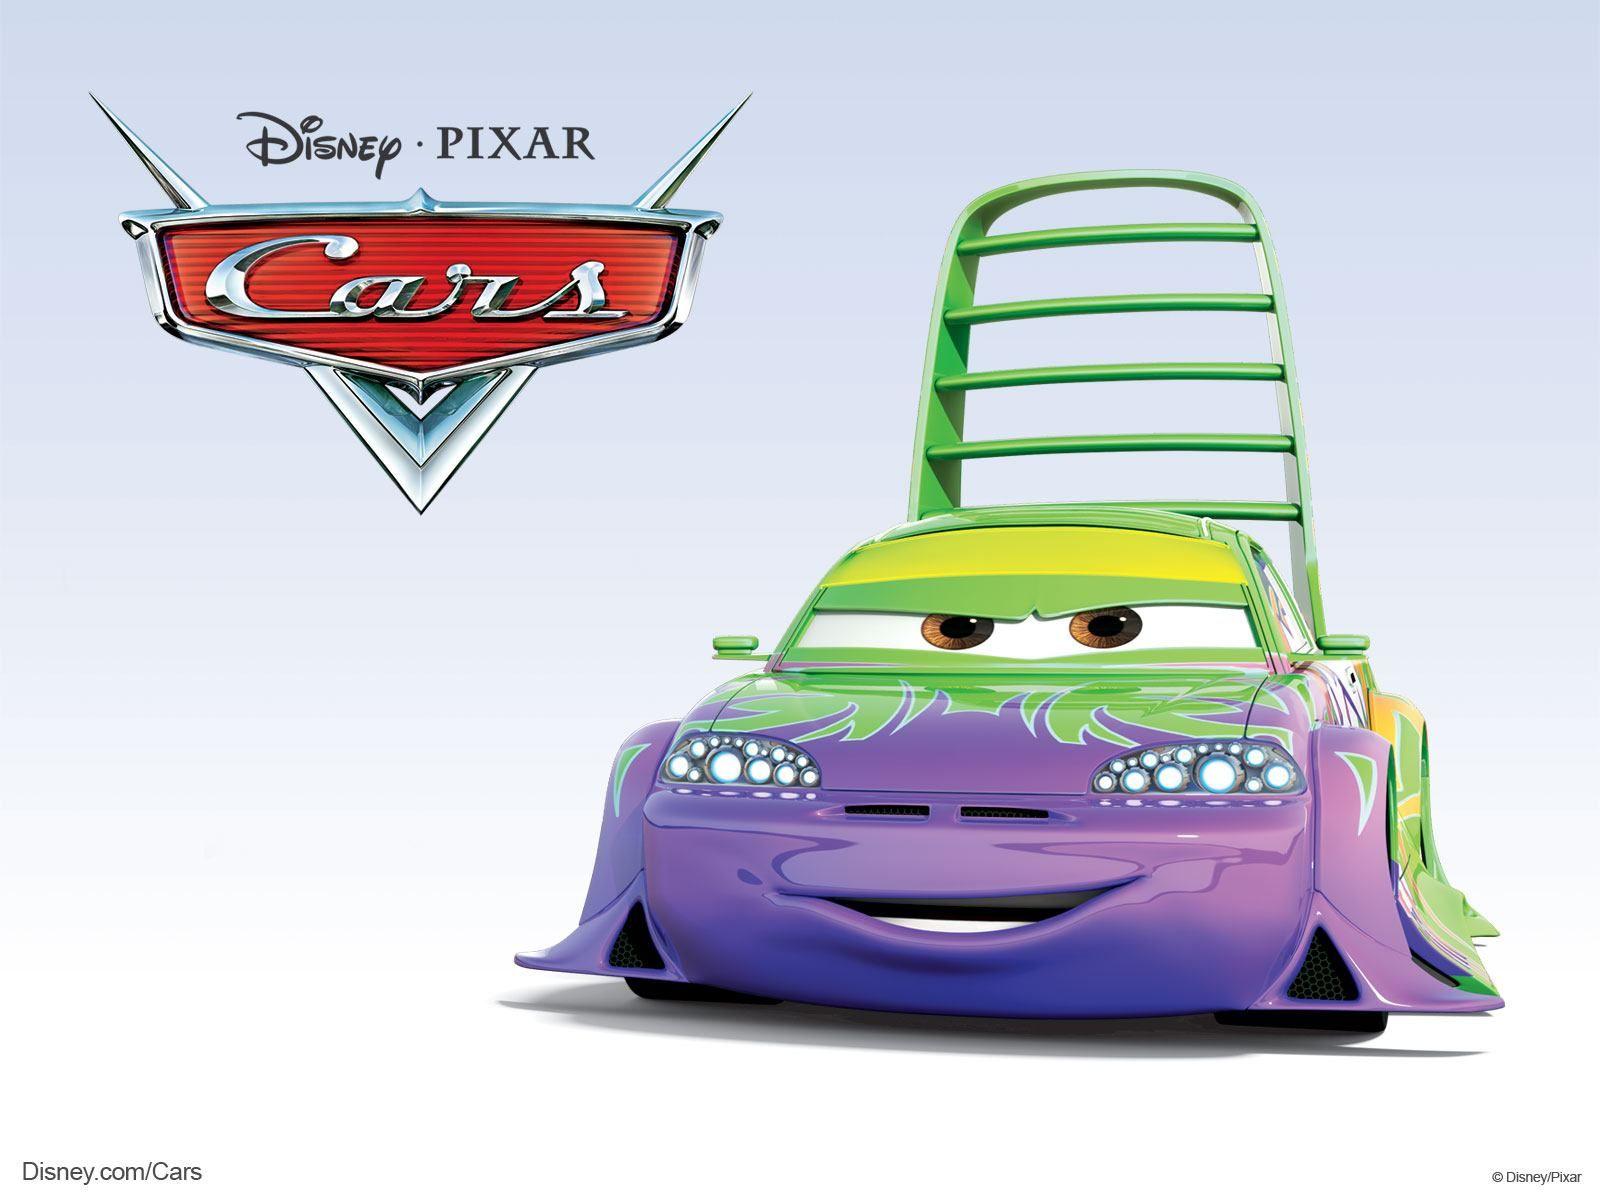 Wingo 2 Pixar Cars Wallpaper Cars Movie Wallpapers Disney Cars Characters Cars Characters Pixar Cars